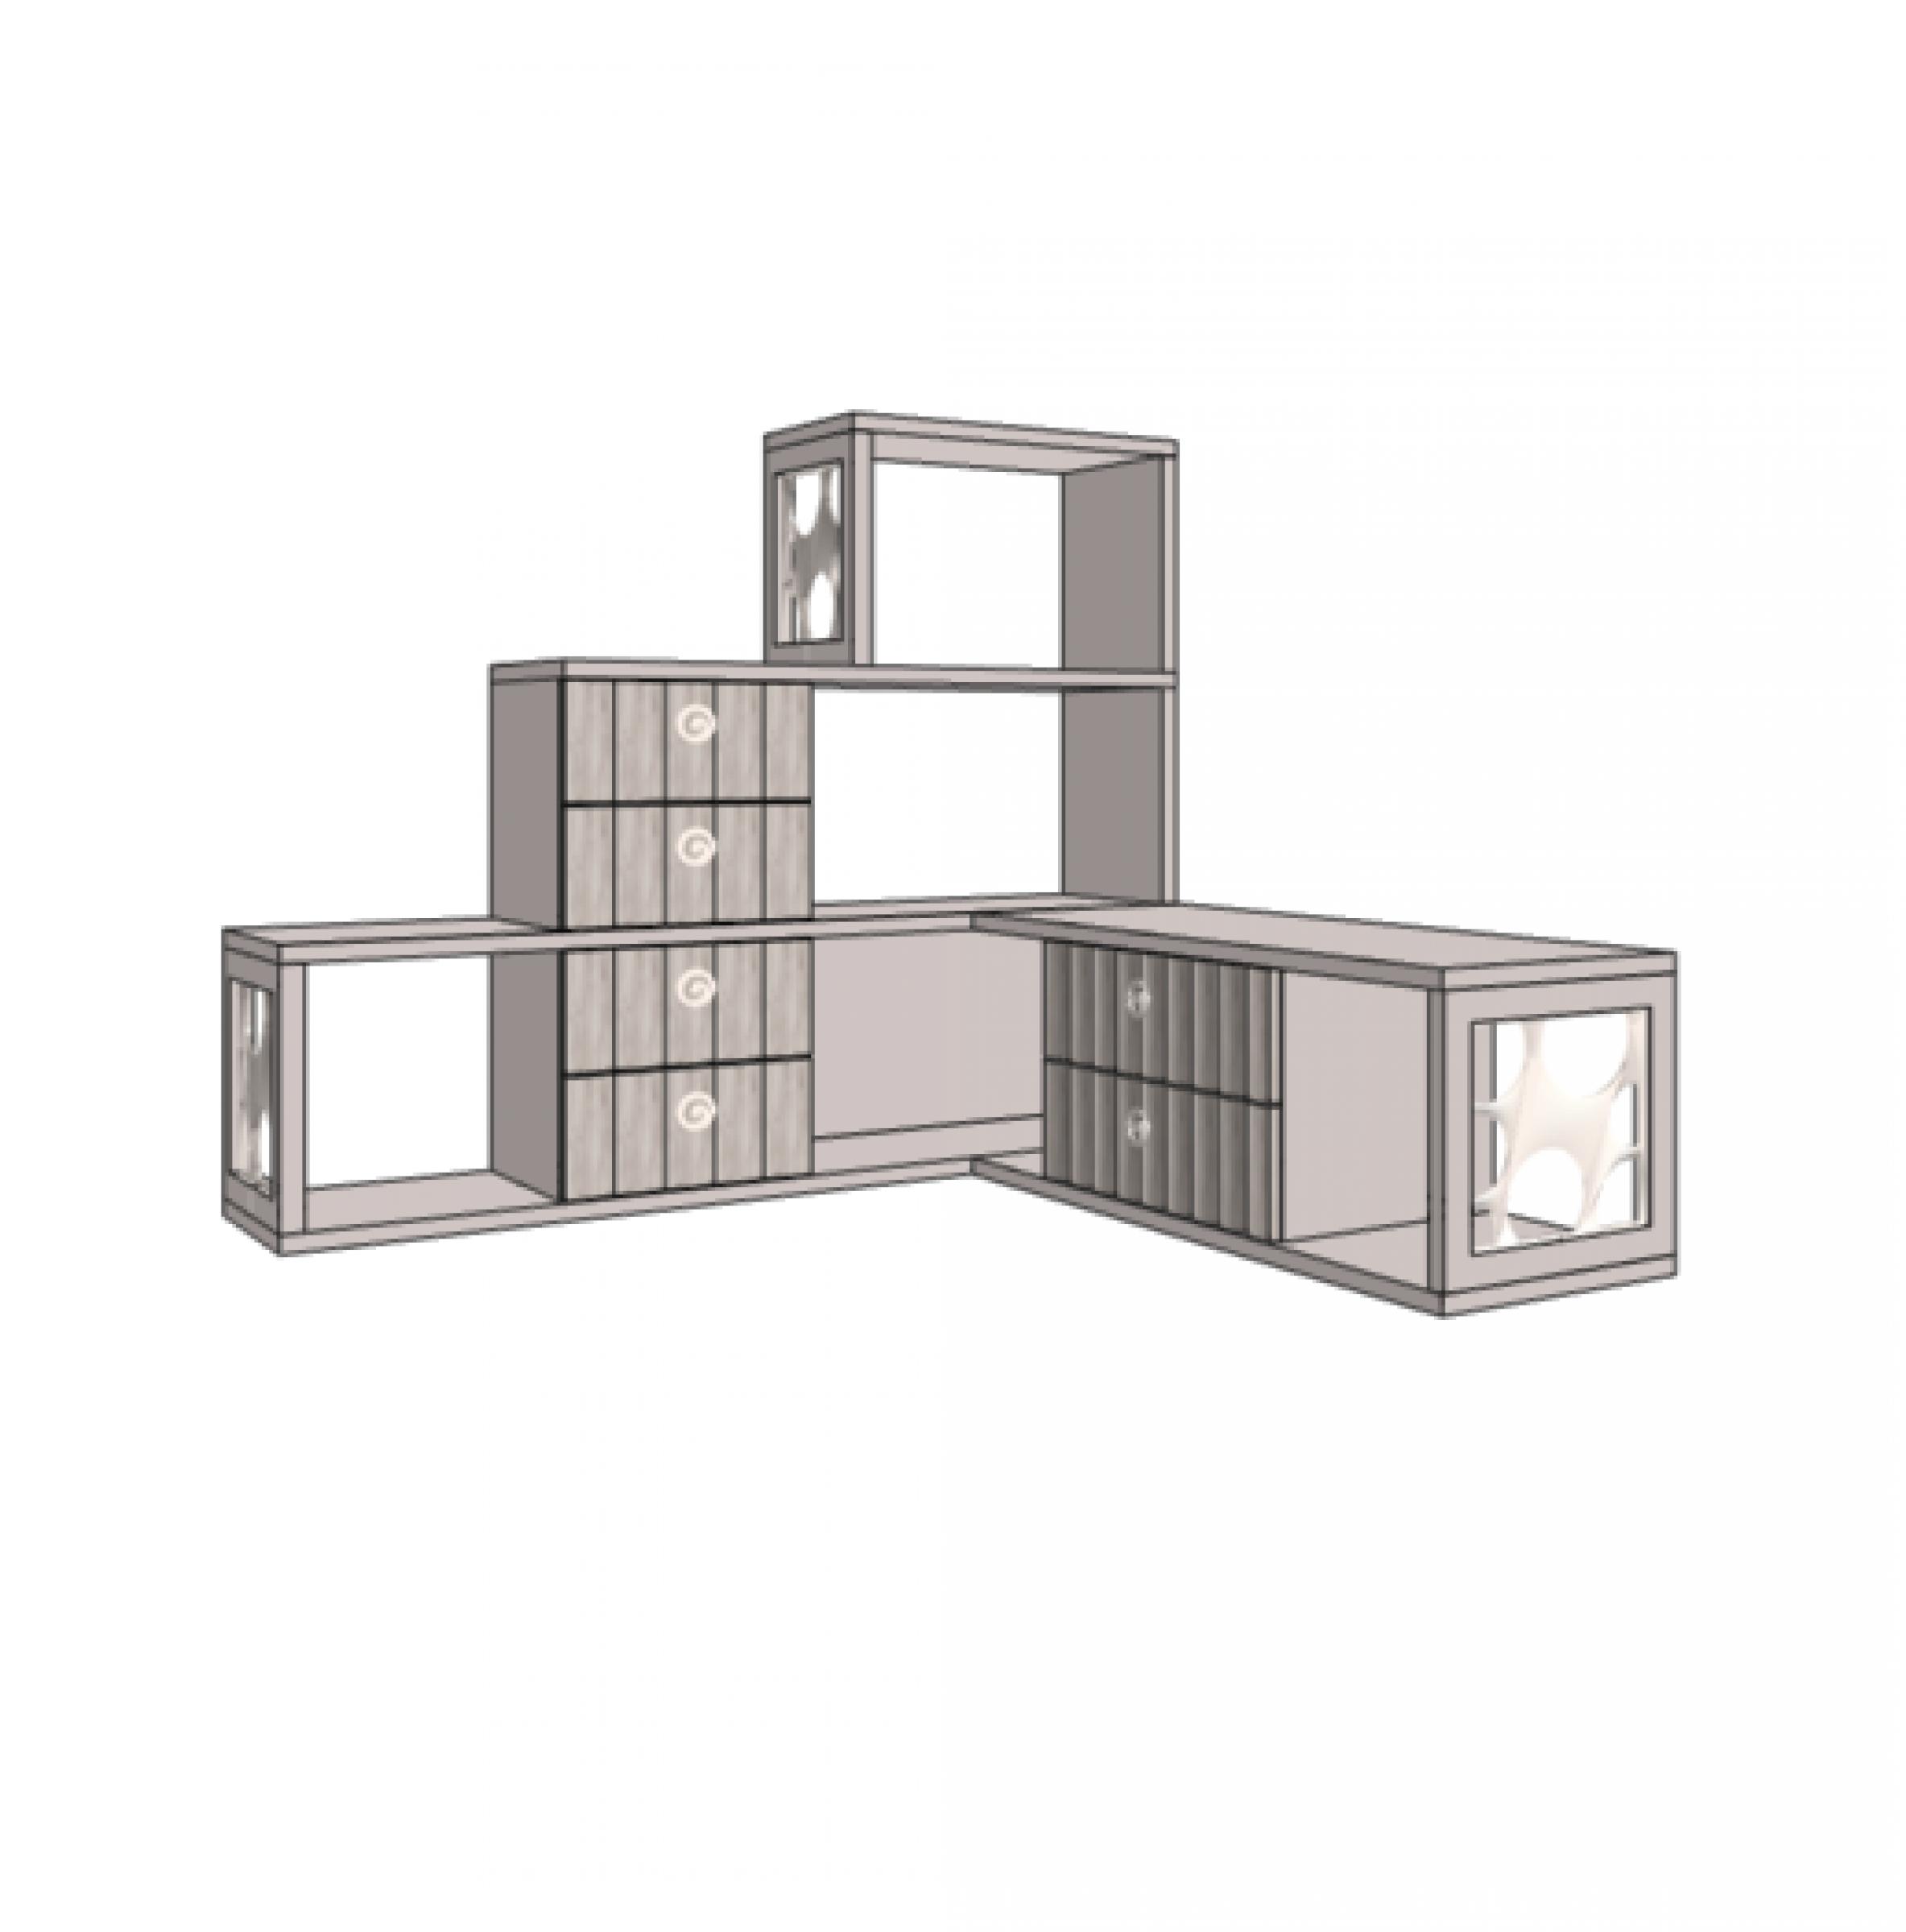 Klюkva горка 3-этажная угловая с 6-ю ящиками, левая. Артикул: VGC1LQ